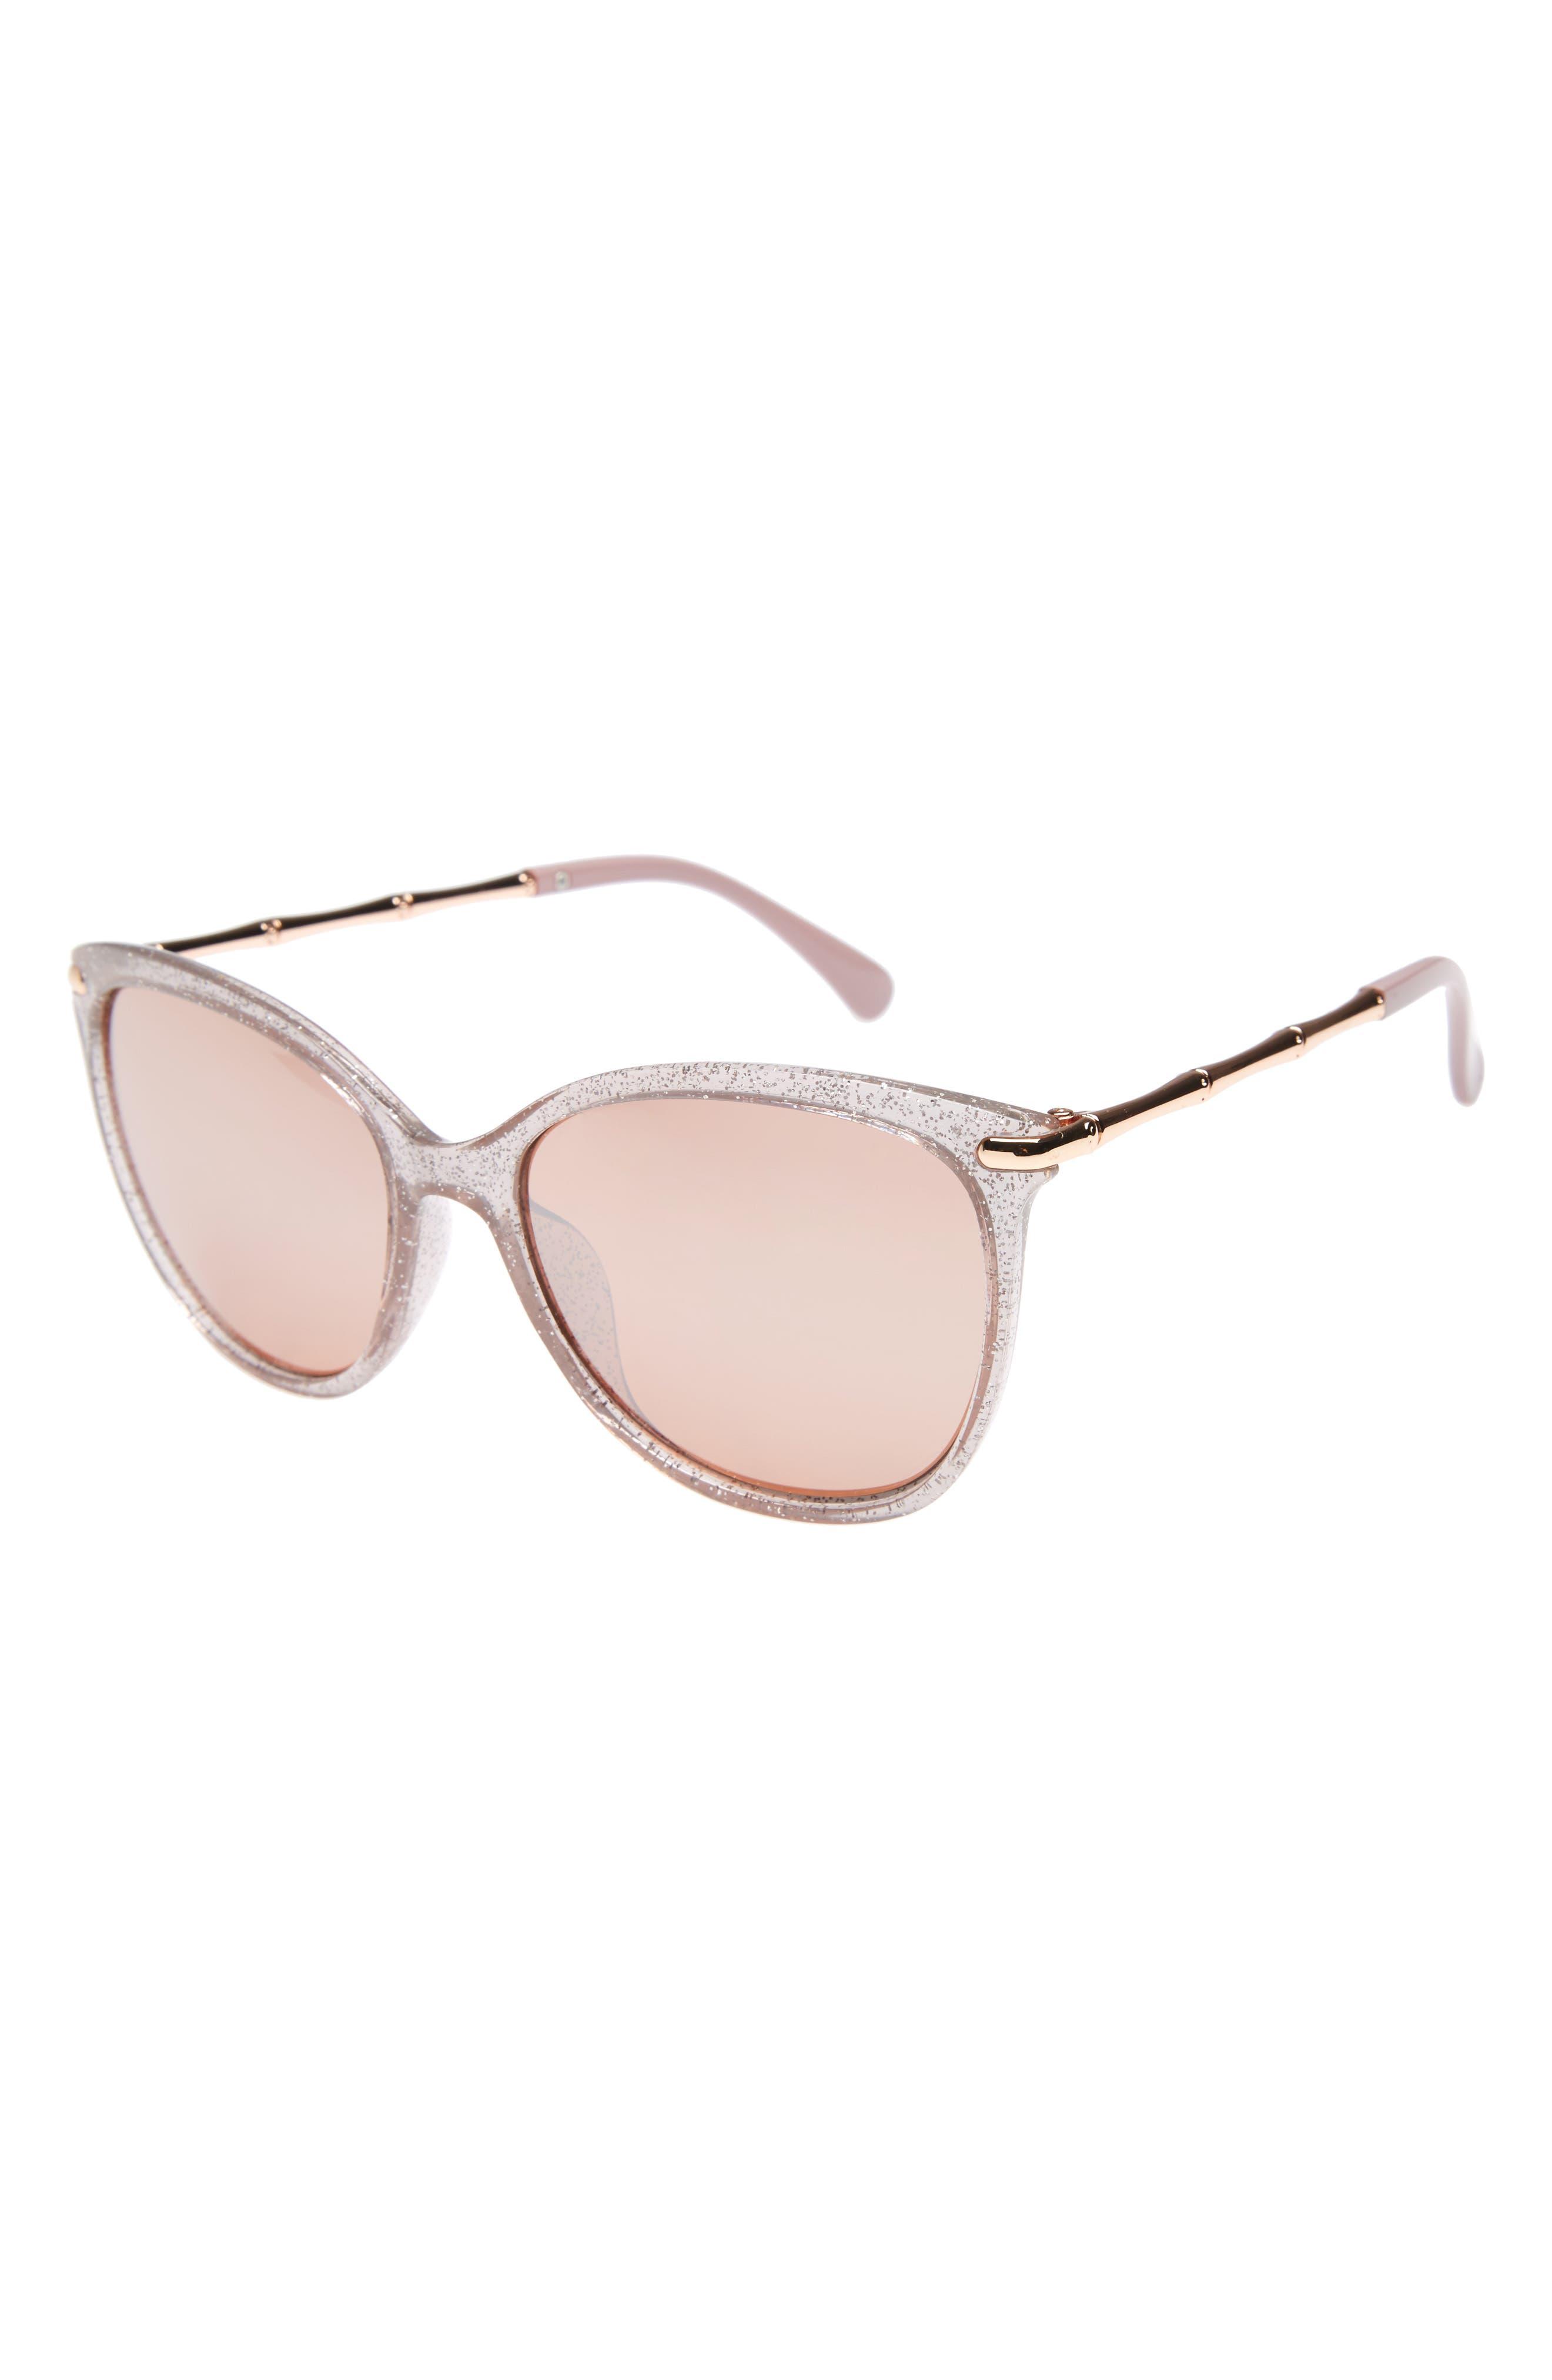 Glitter Sunglasses,                         Main,                         color, Pink Glitter/ Rose Gold